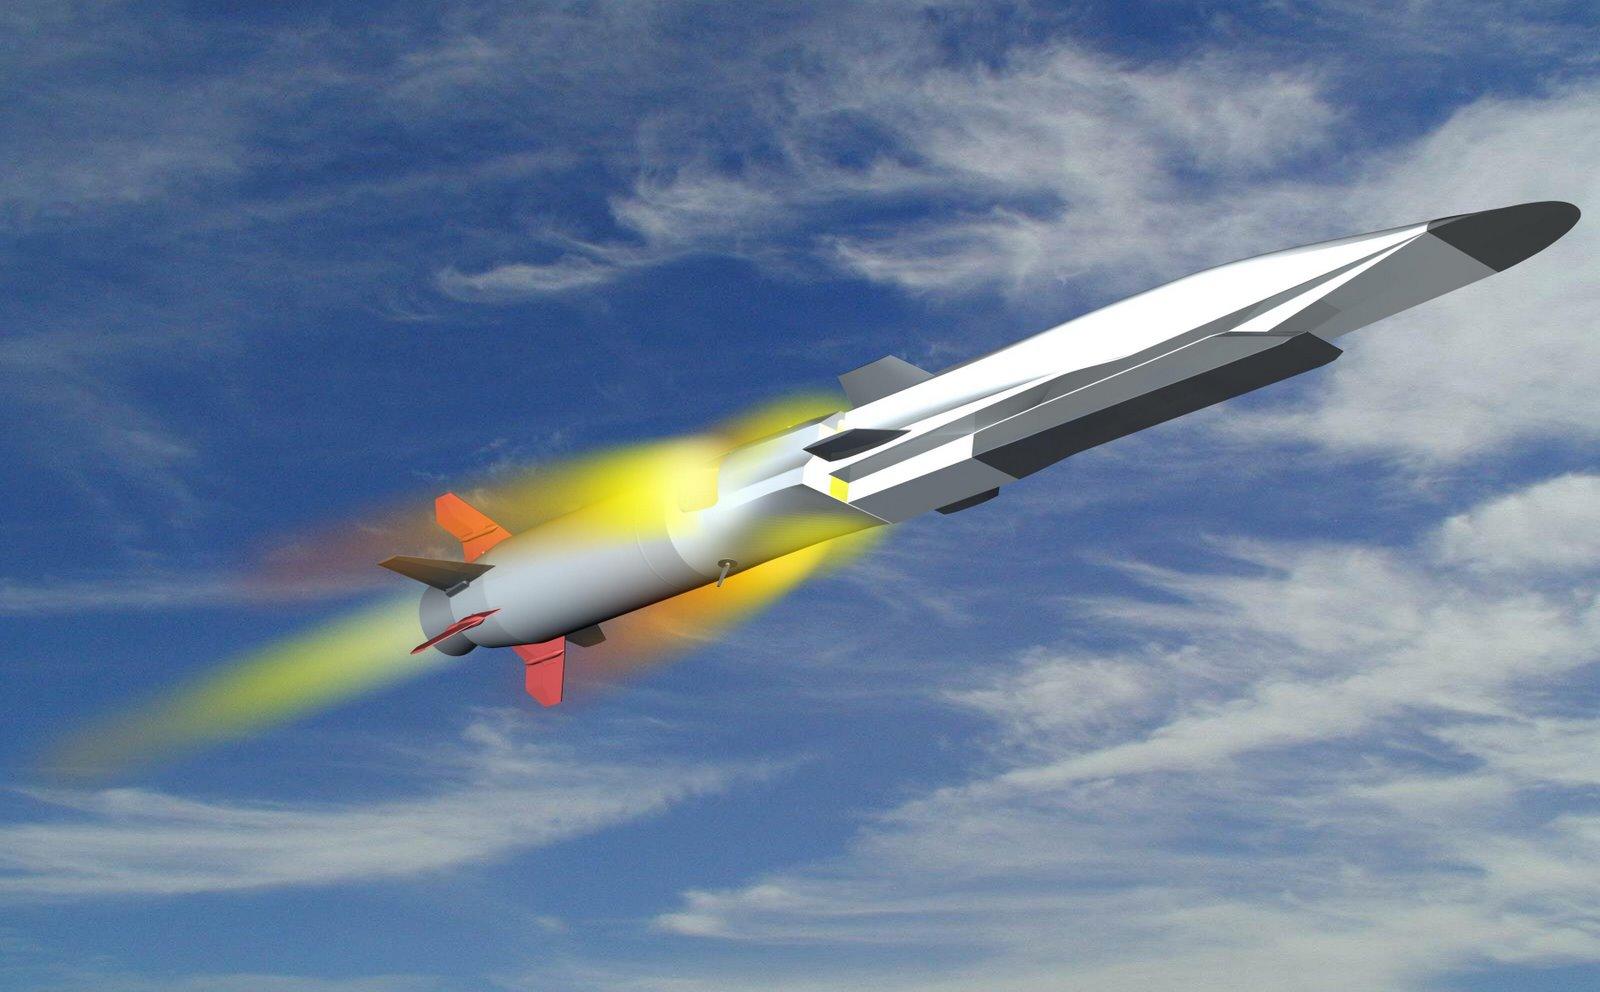 Rusia-Tiongkok Kembangkan Hypersonic Gliders untuk Taklukkan THAAD Amerika Serikat